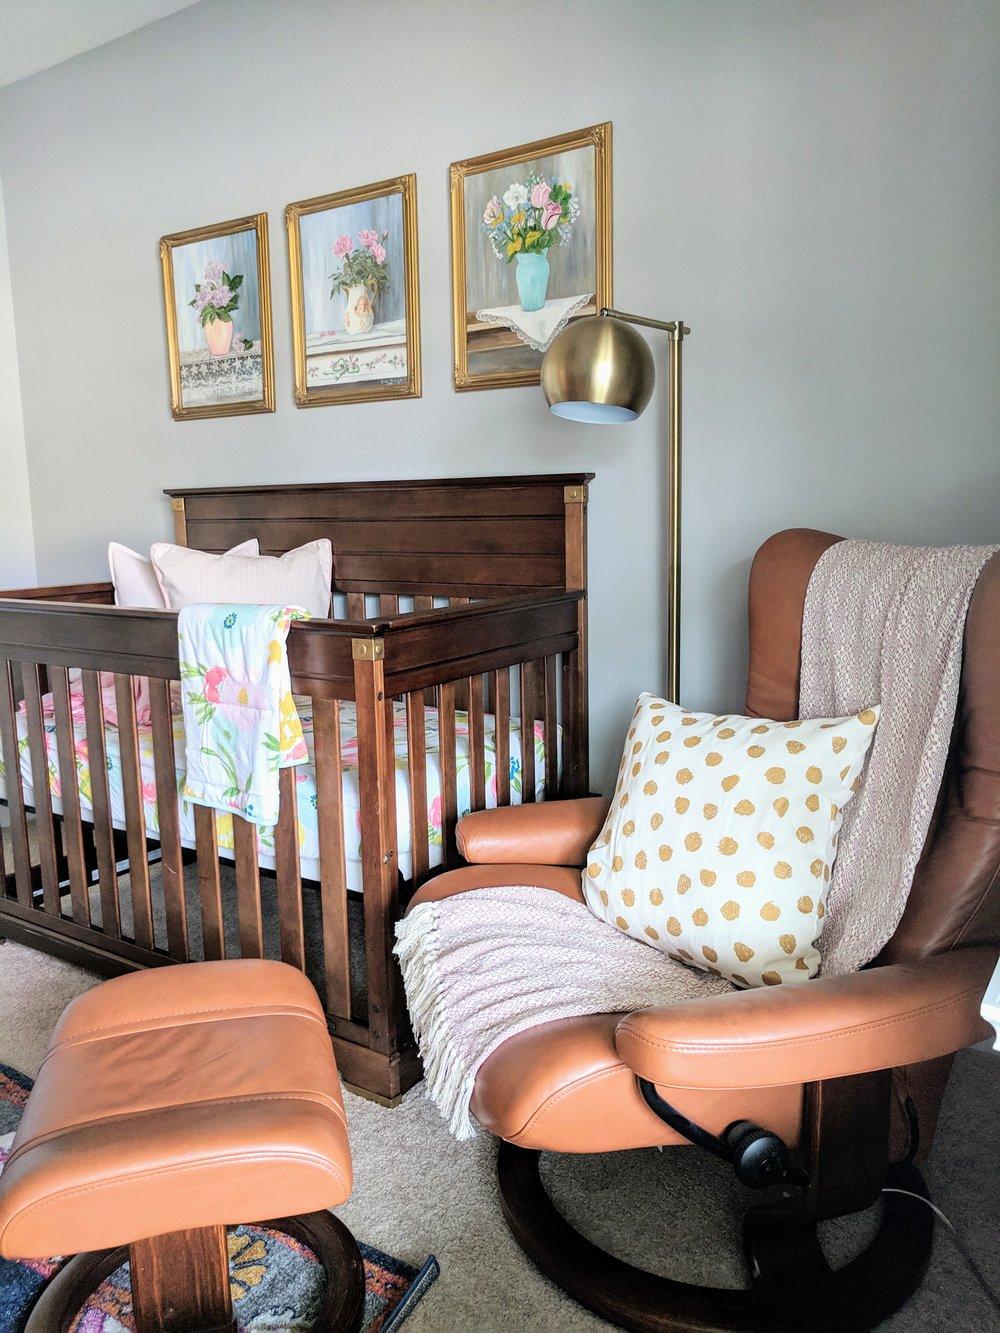 re-purposing a boy crib for a girl